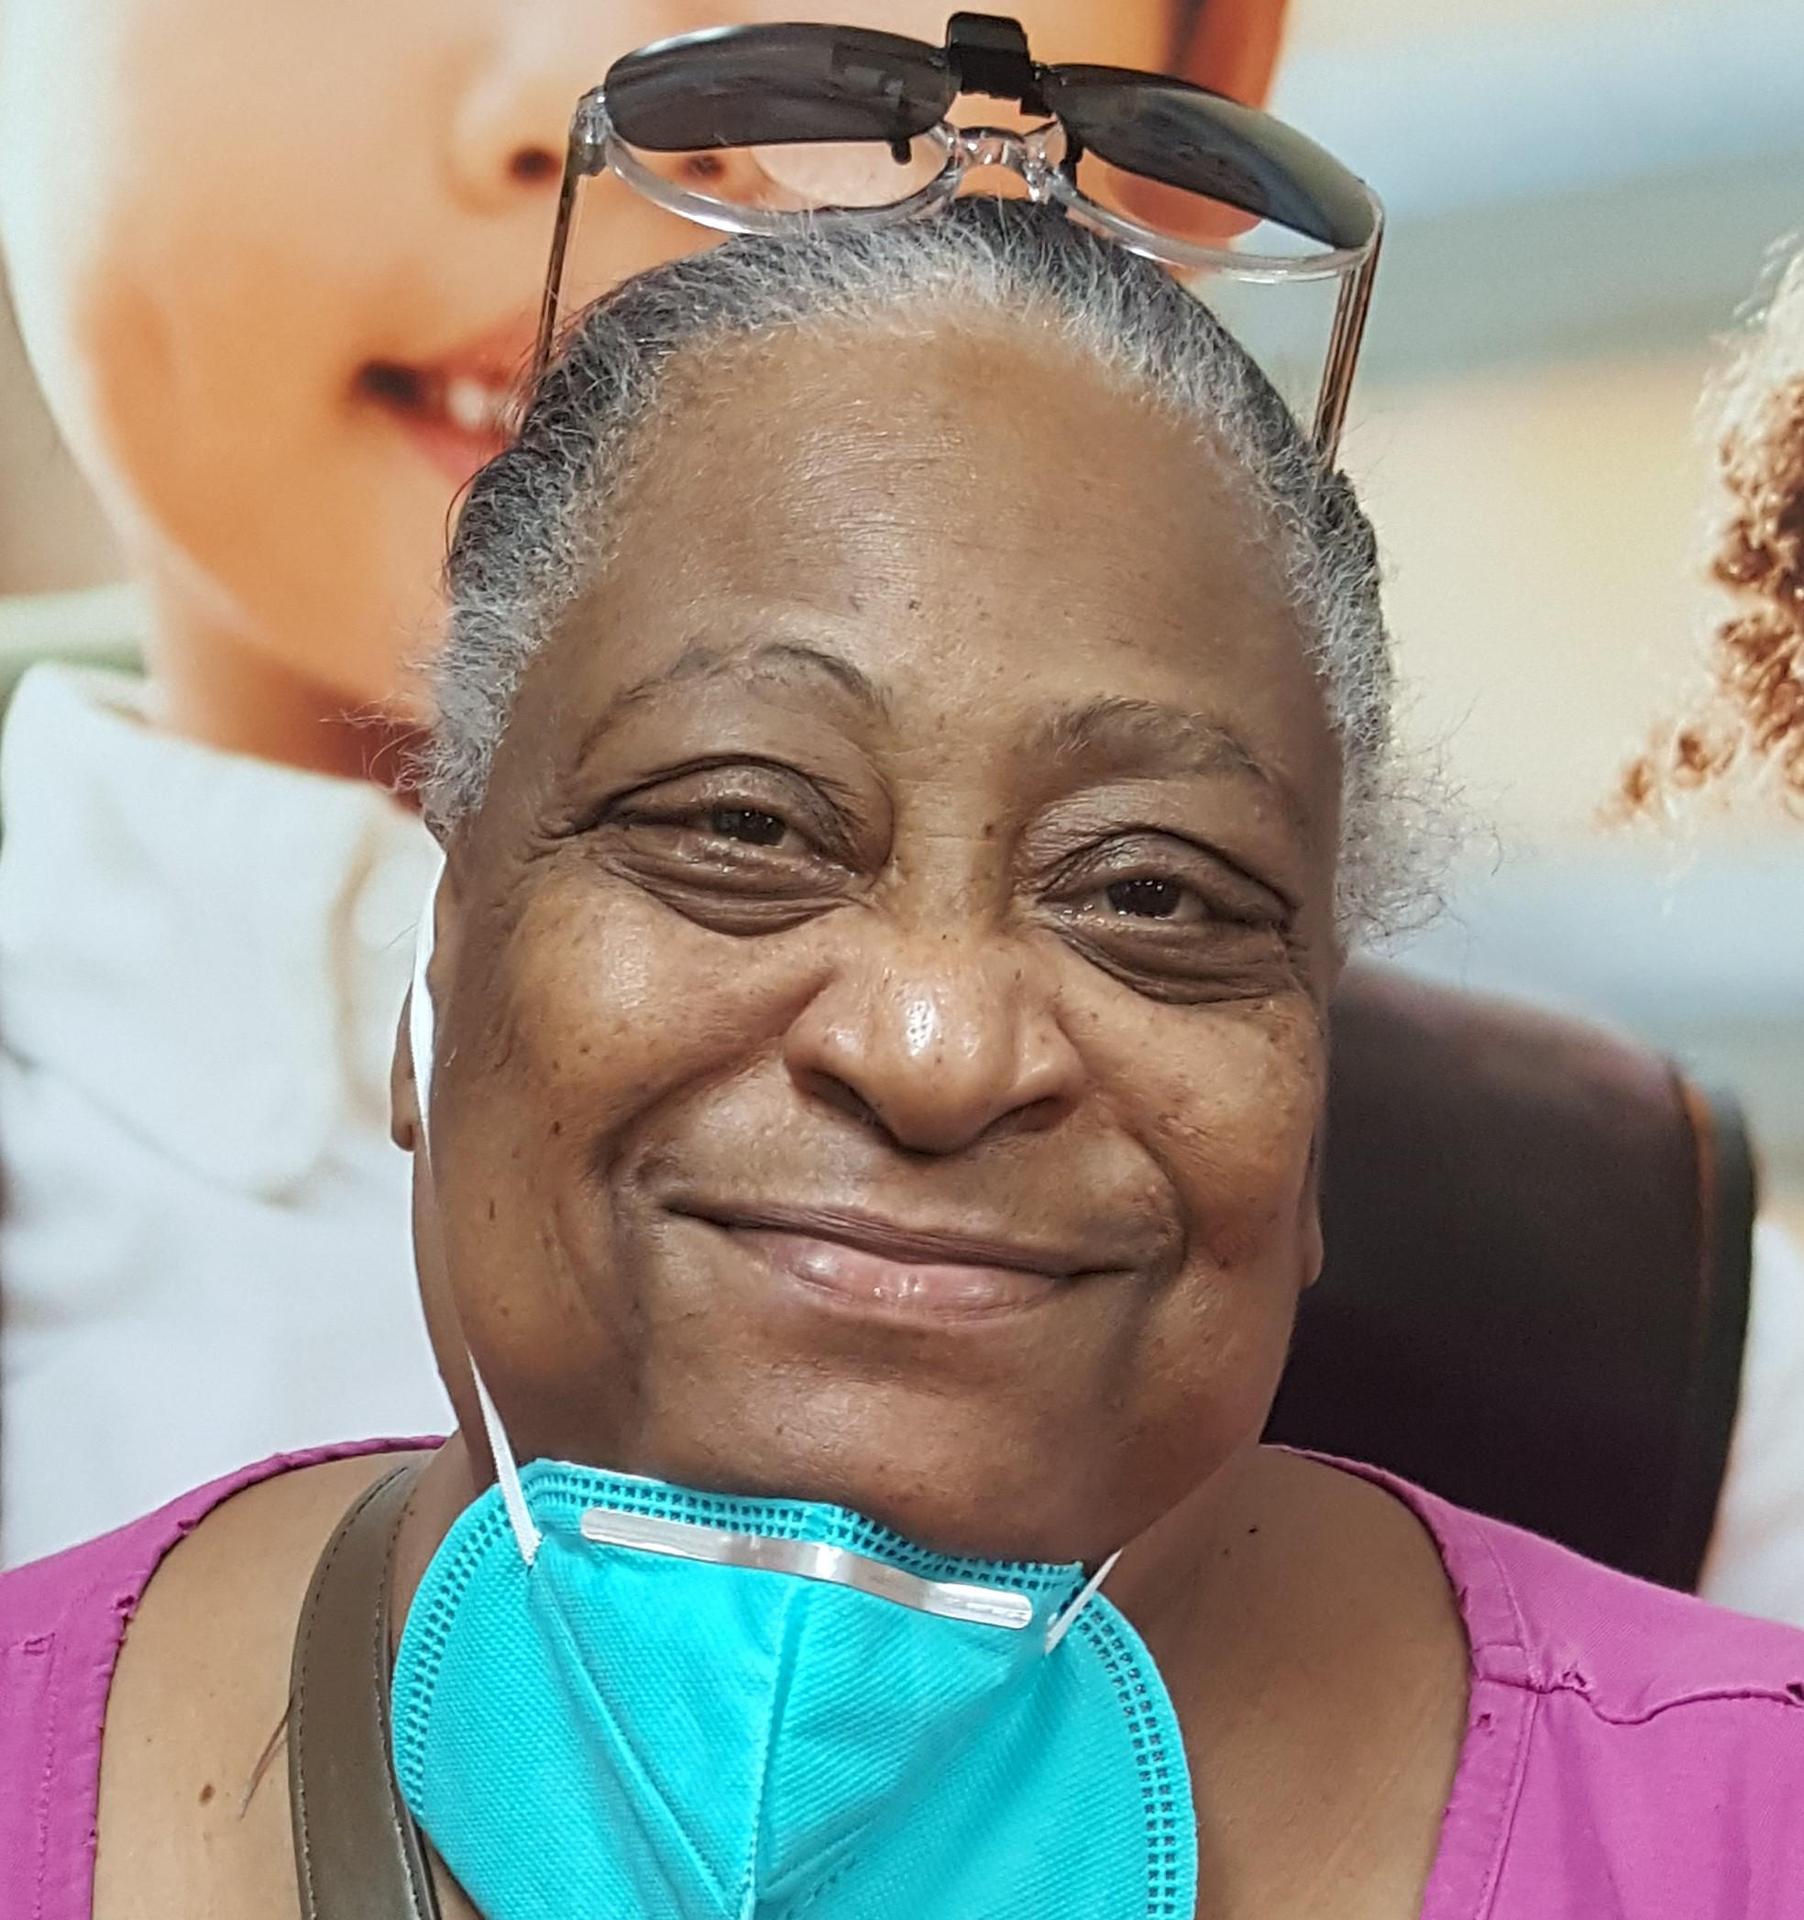 Ms. Paula